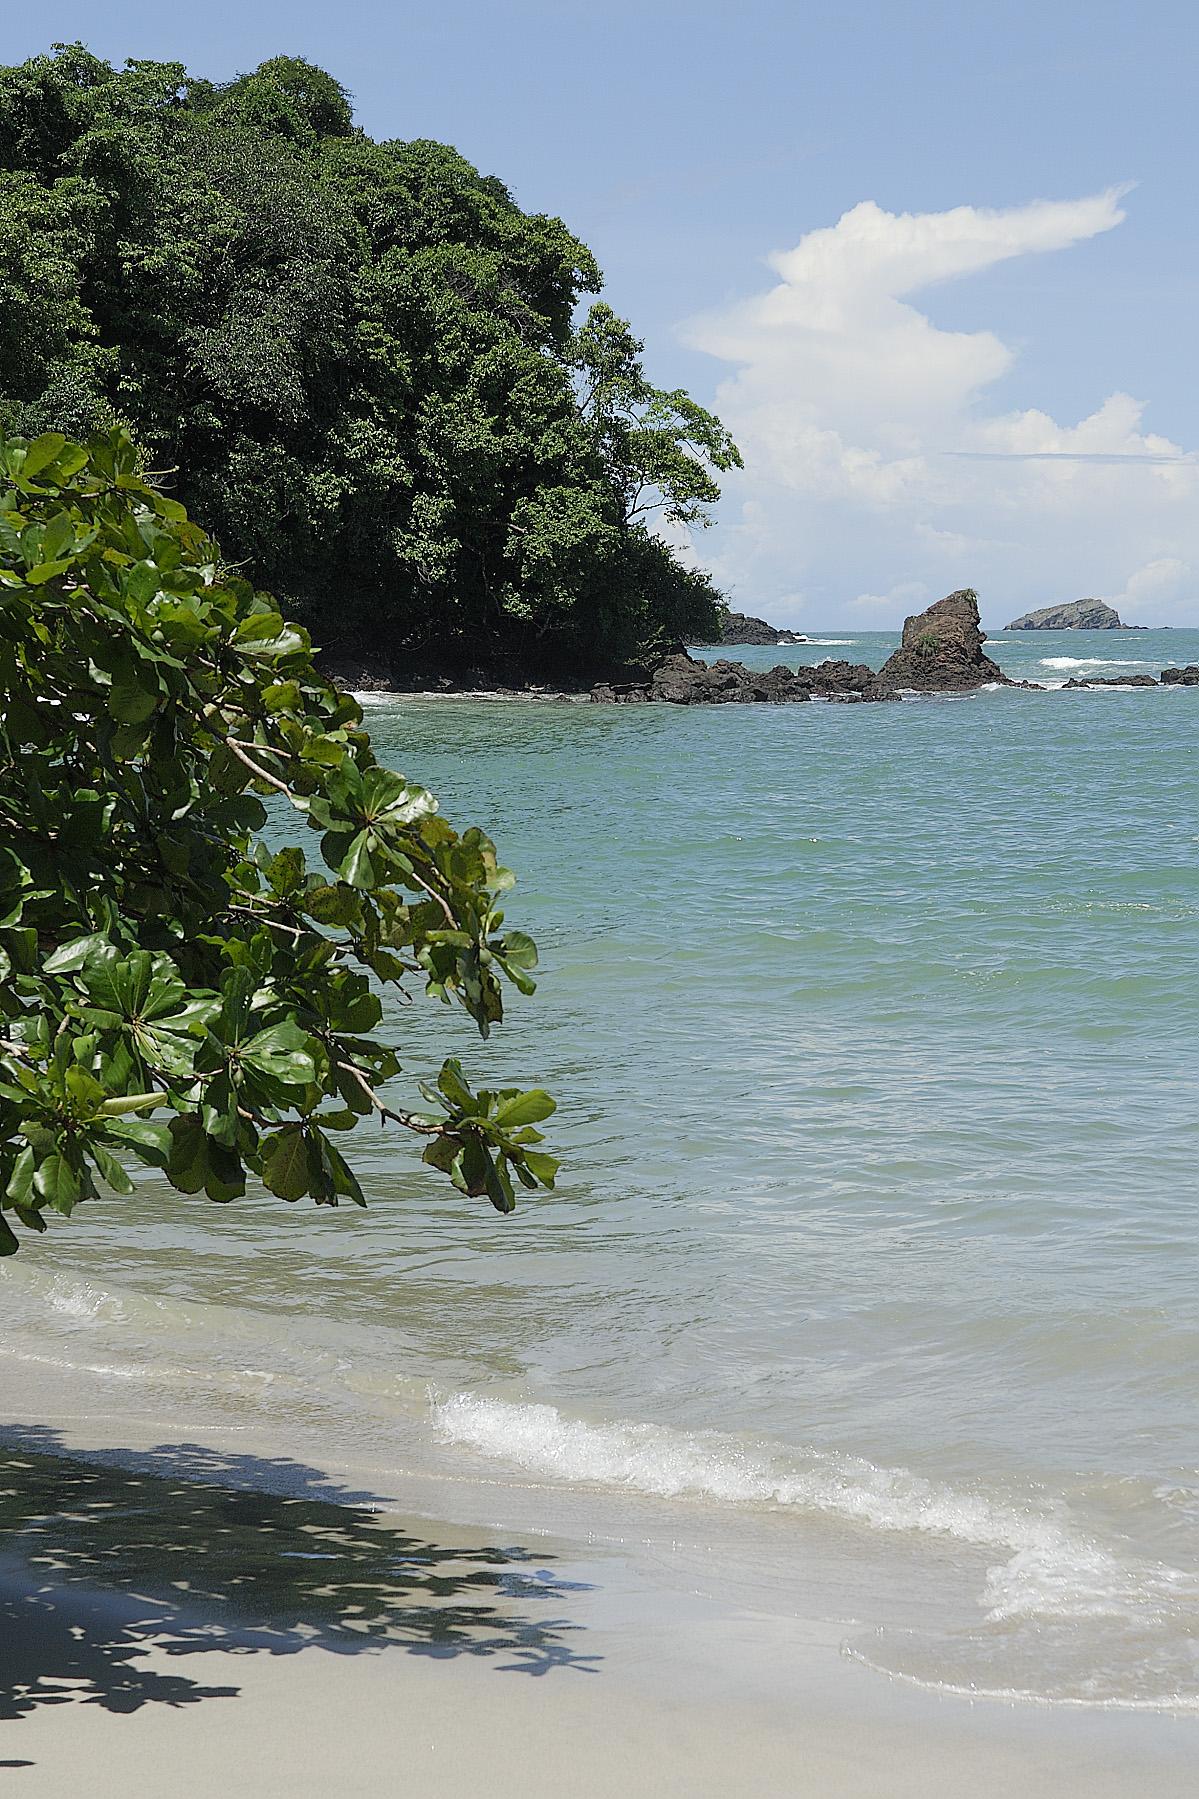 20070628 - Costa Rica - 896.jpg